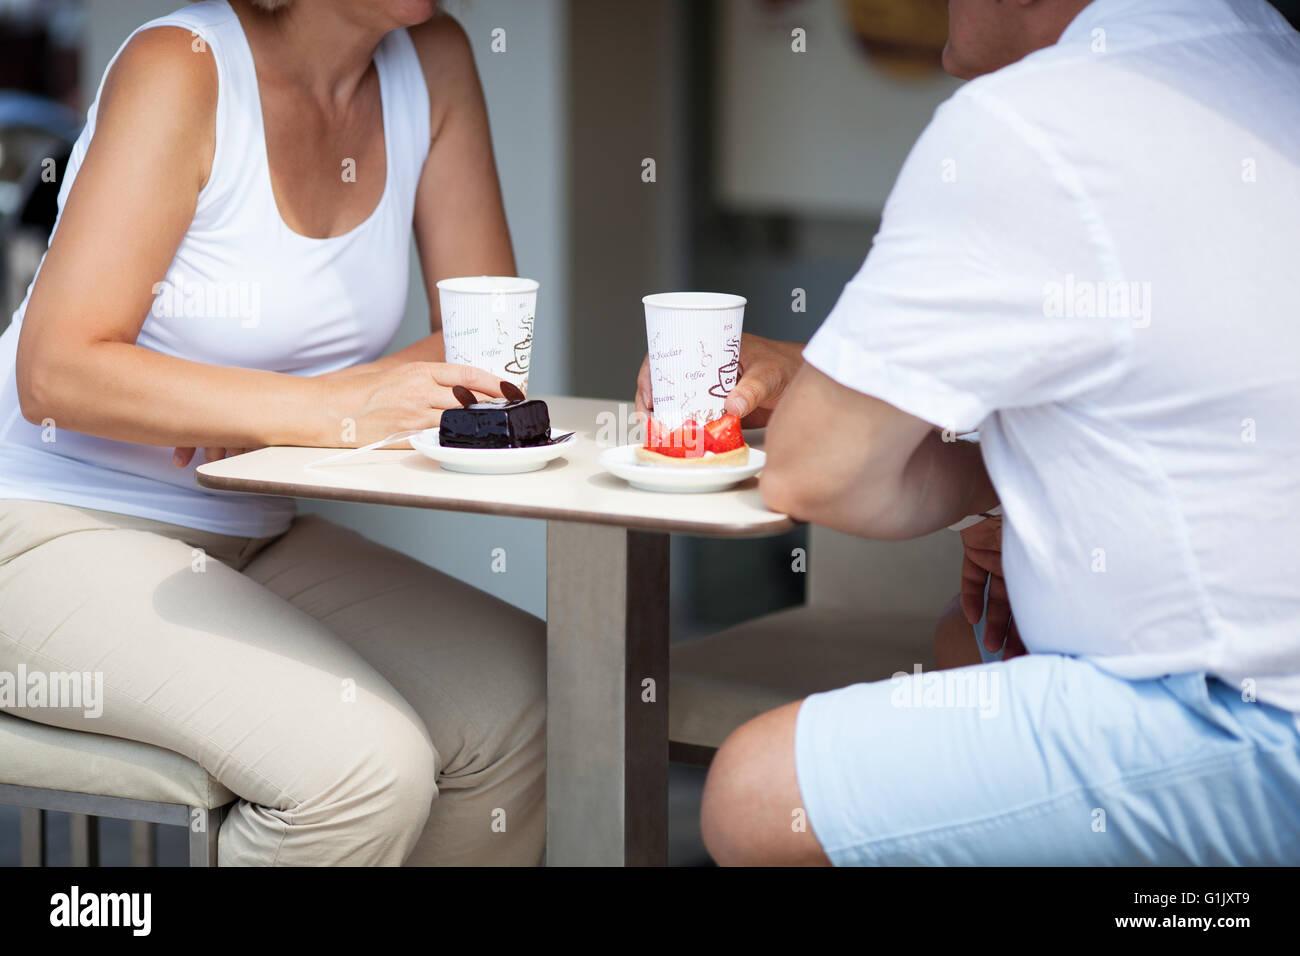 Couple Enjoying Coffee and Desserts on Cafe Patio - Stock Image